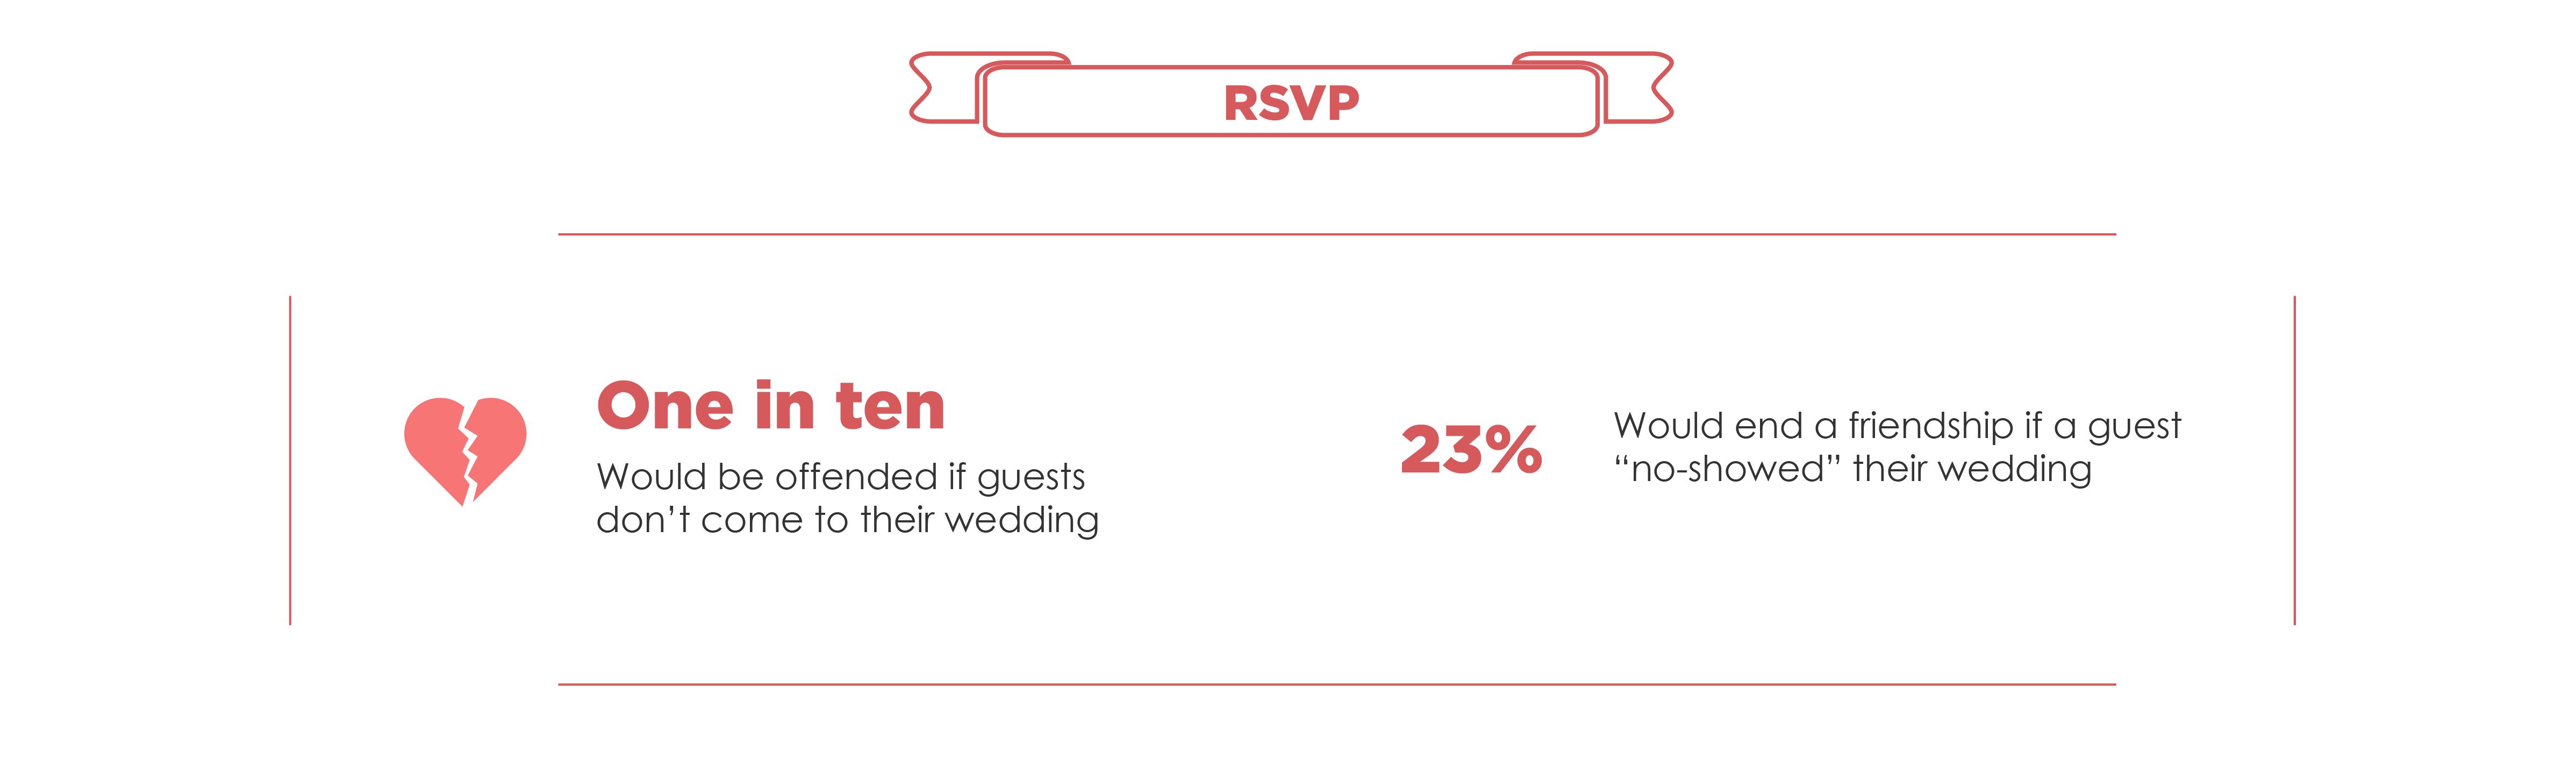 Wedding Invites-RSVP